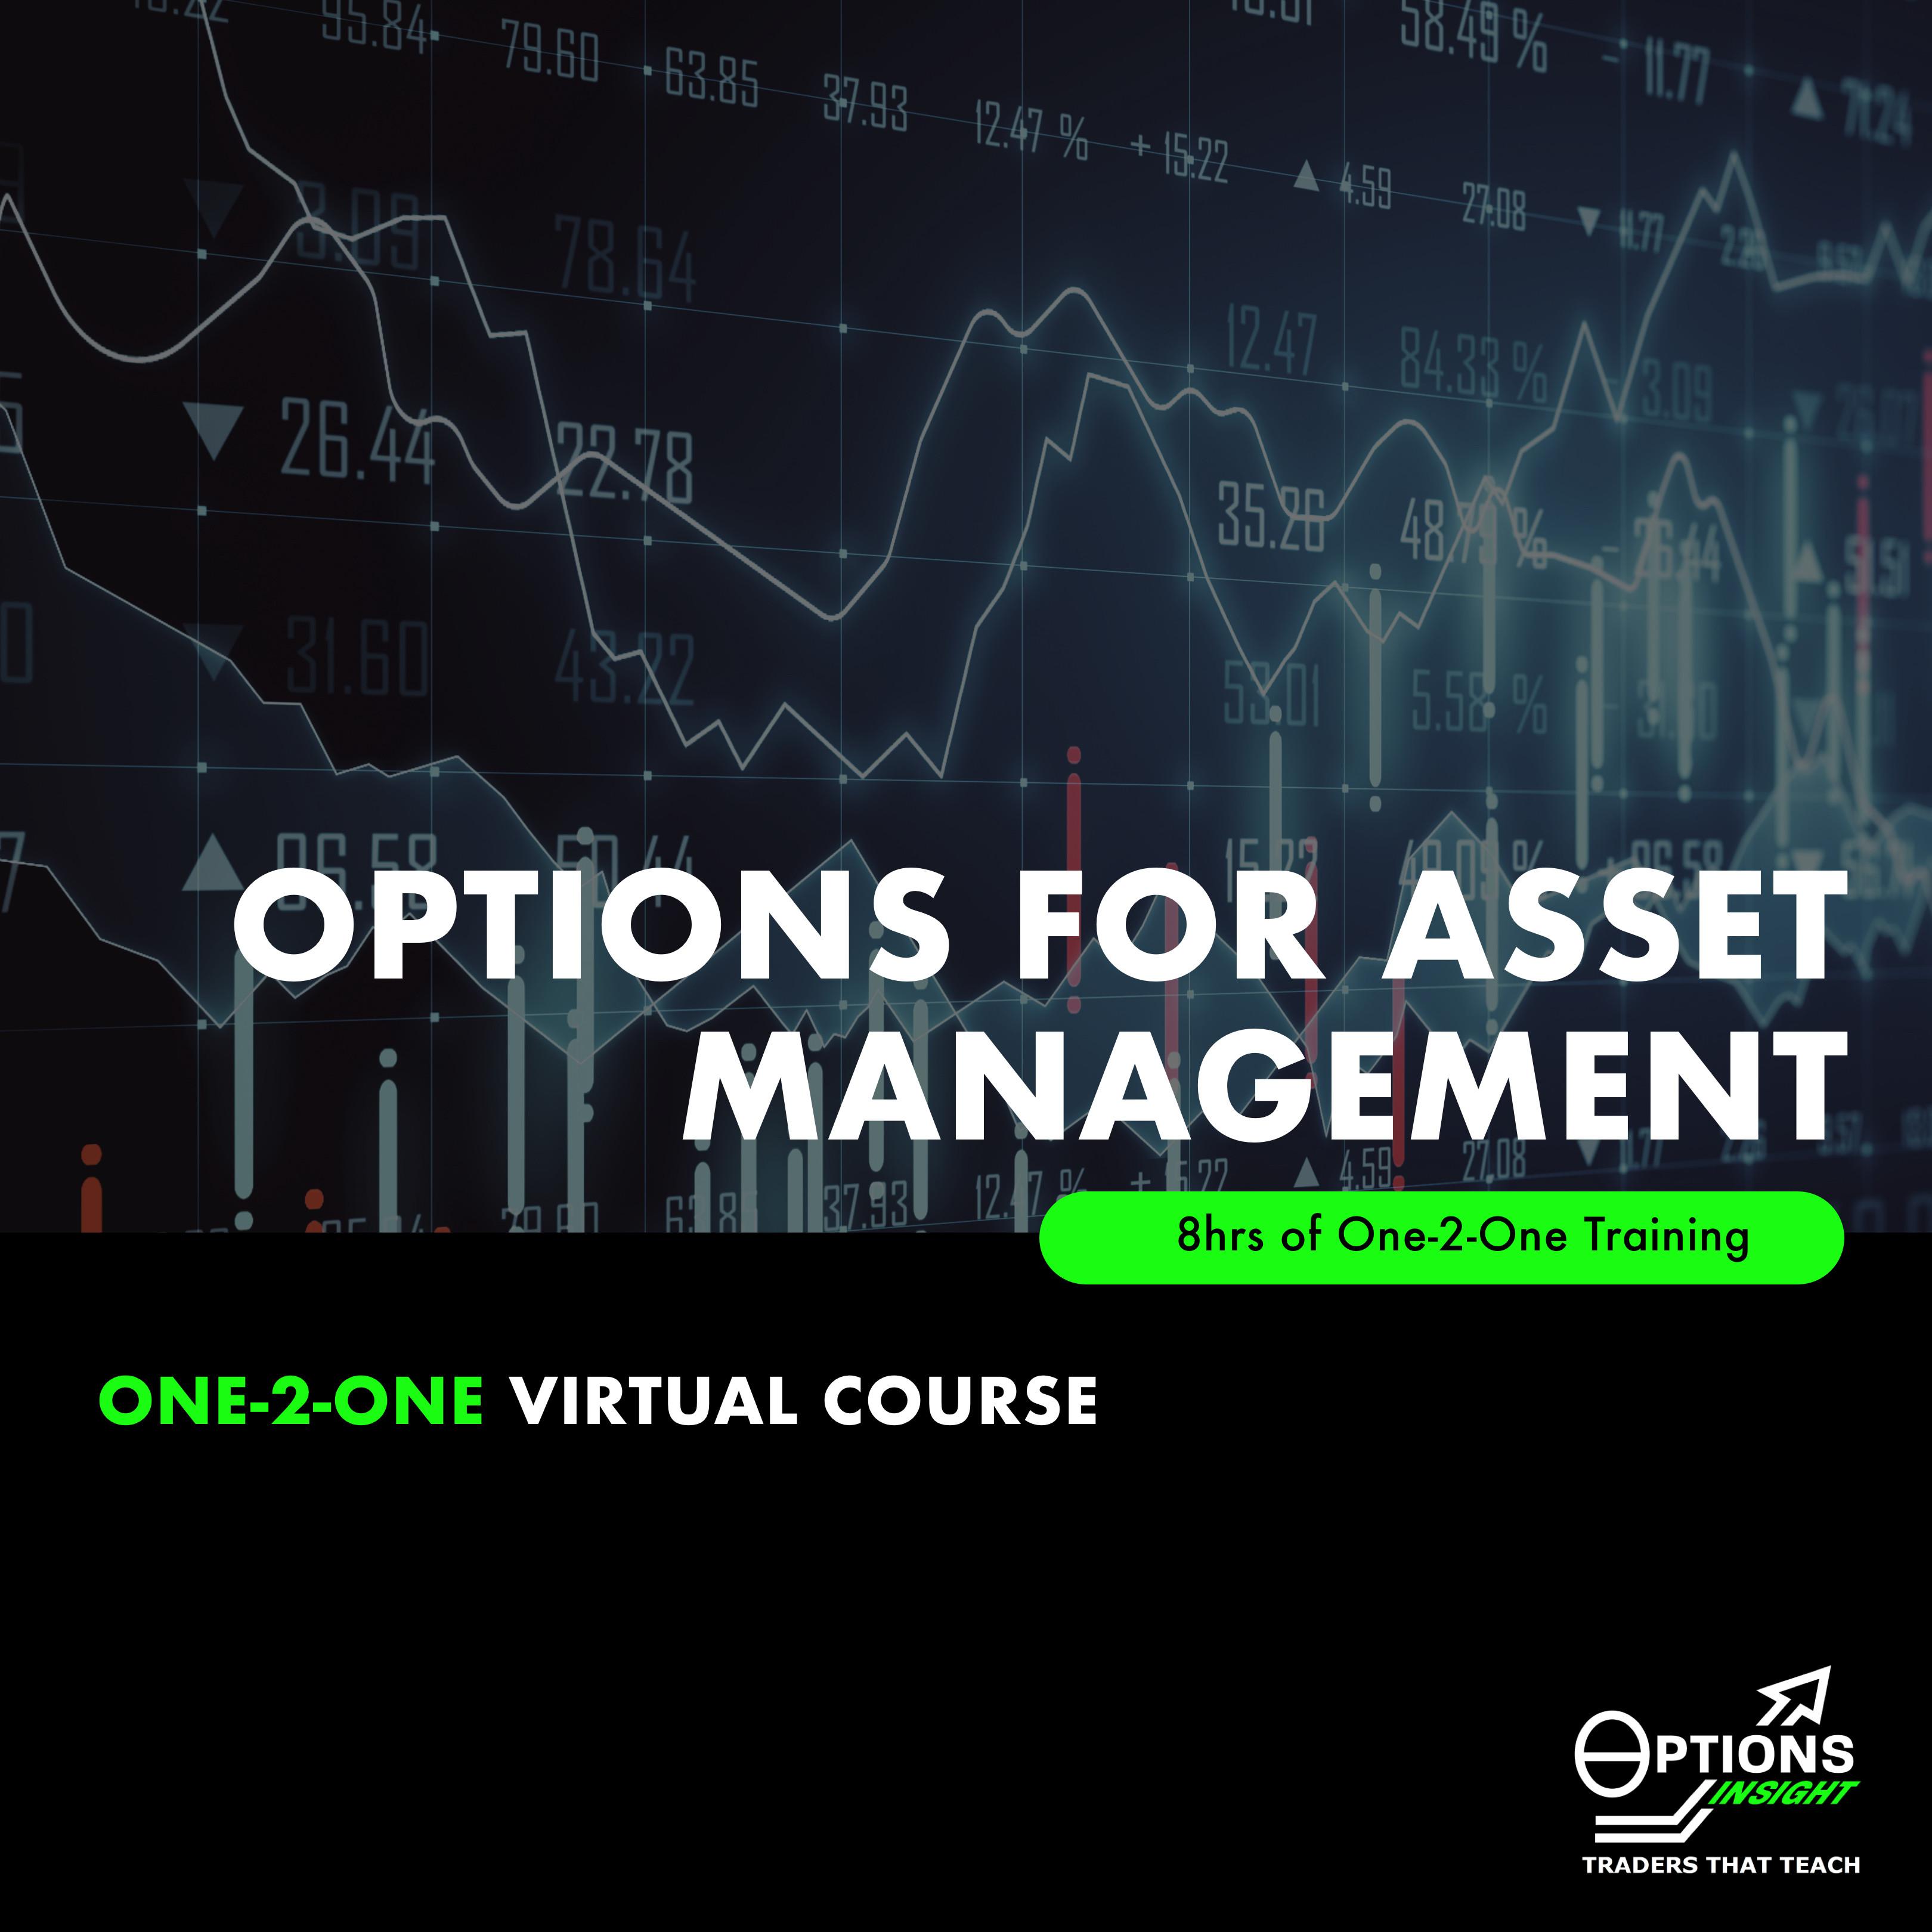 OPTIONS FOR ASSET MANAGEMENT